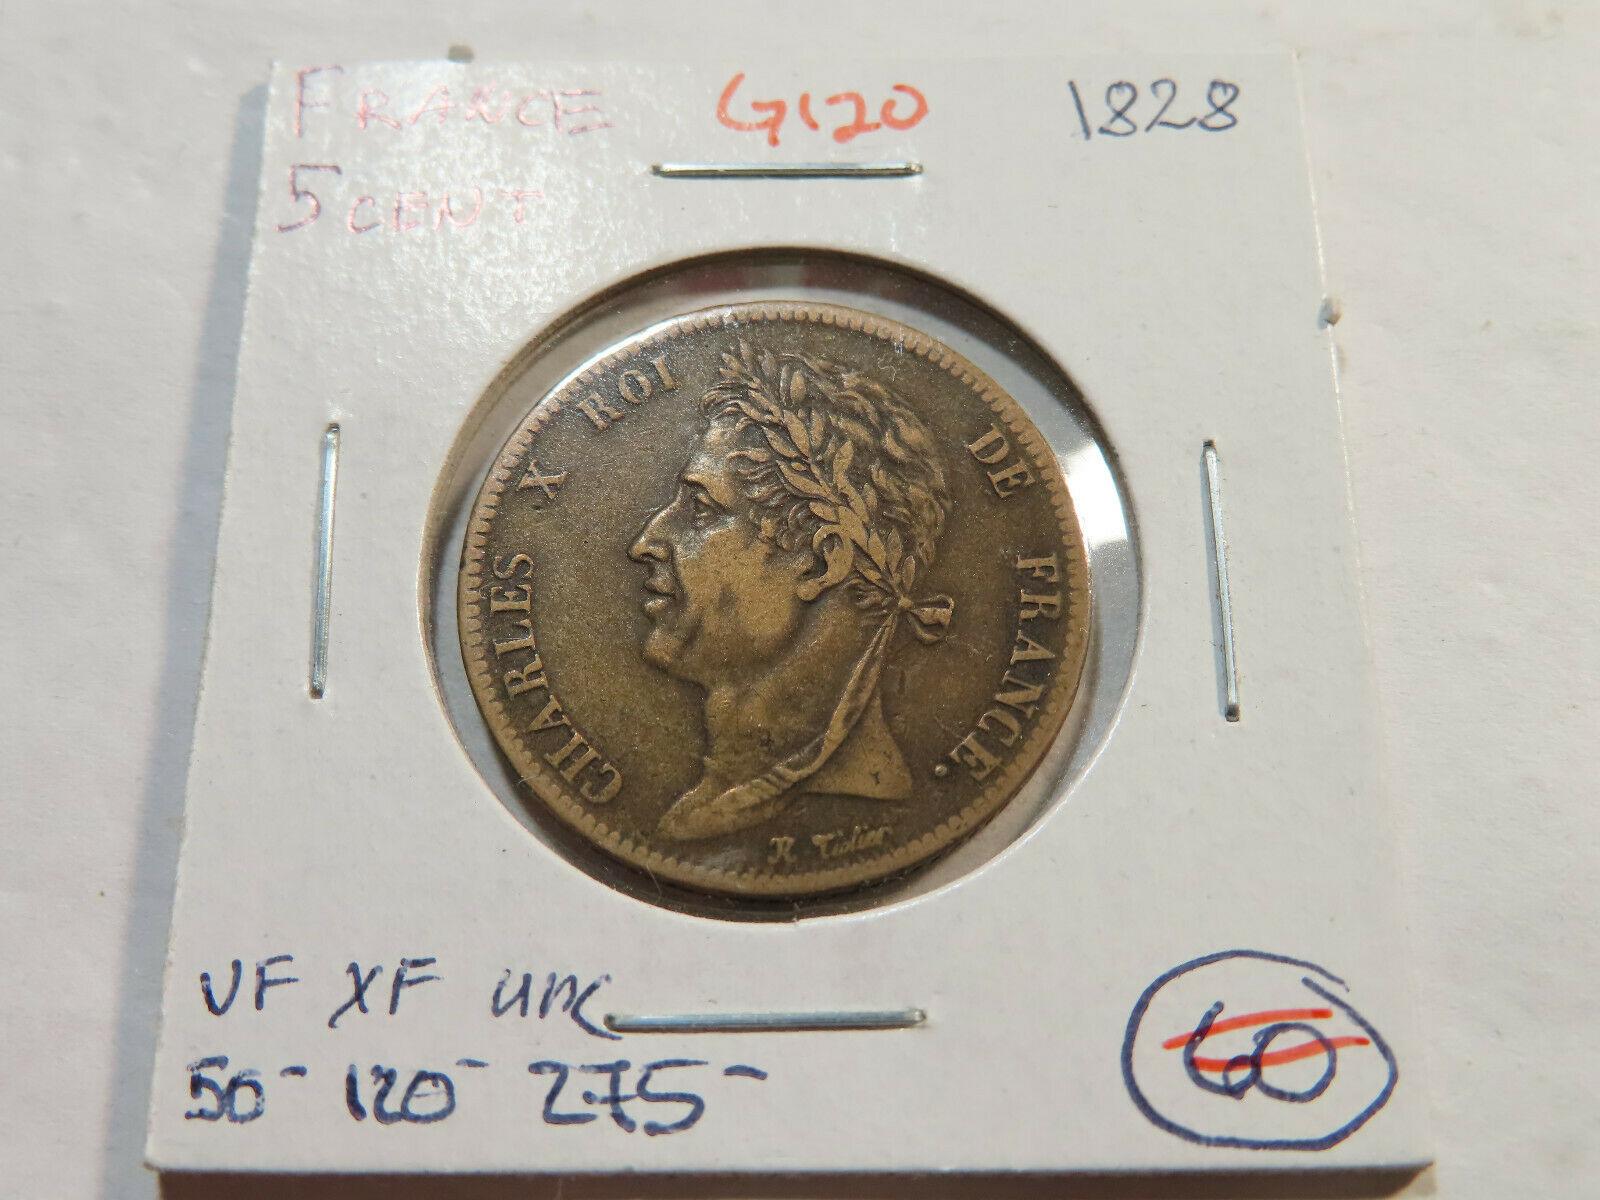 G120 France 1828 5 Centimes - $8.50